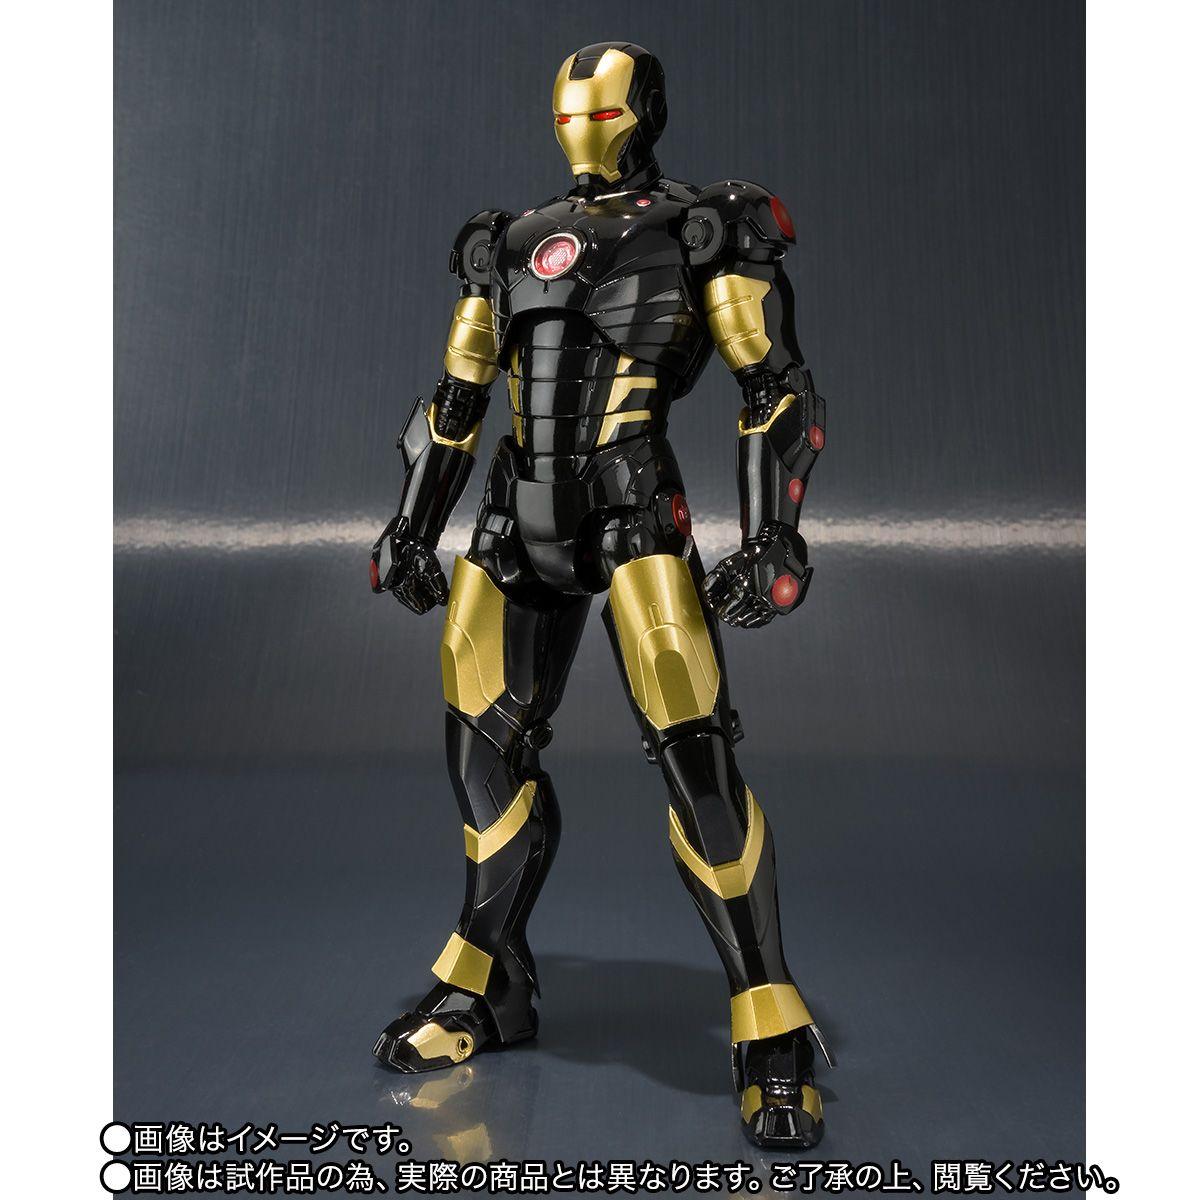 - SH Figuarts Iron Man Mark 3 Marvel Now Colors Iron Man, Marvel